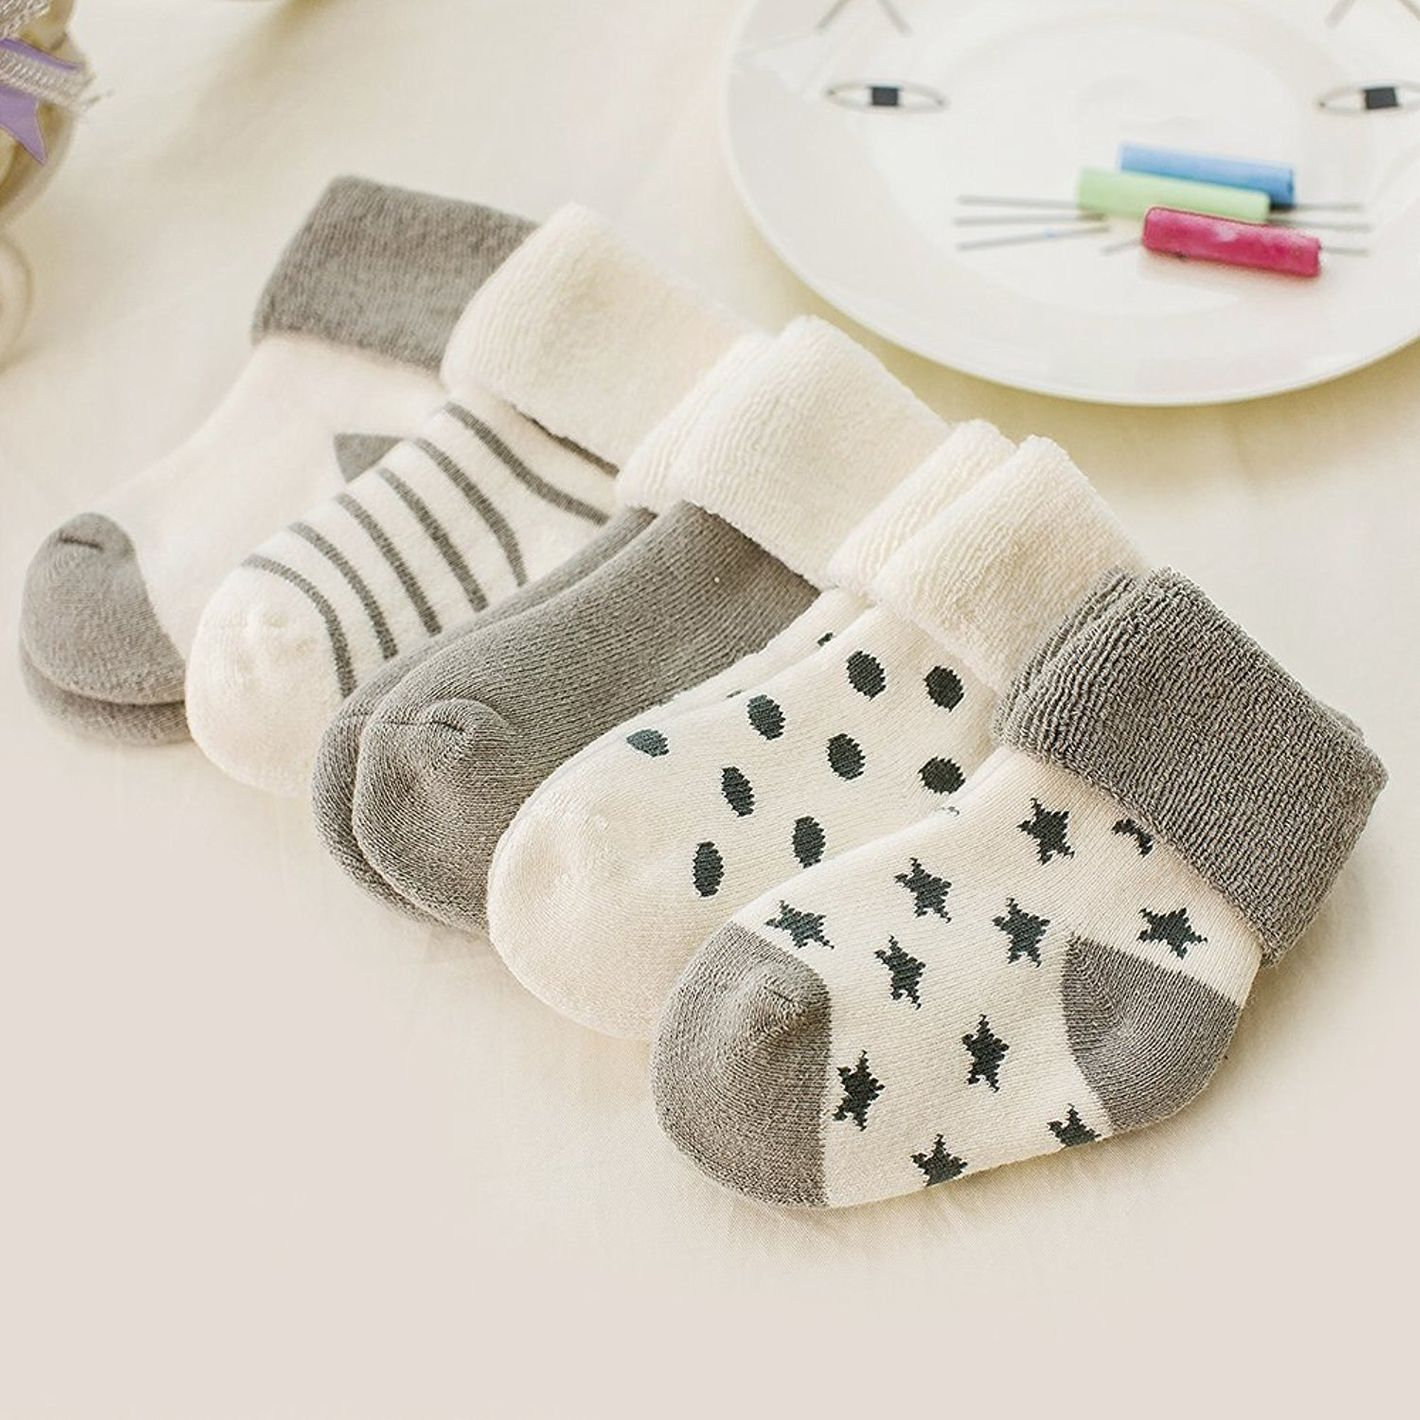 VWU Baby Thick Cuff Cotton Socks 5-Pack